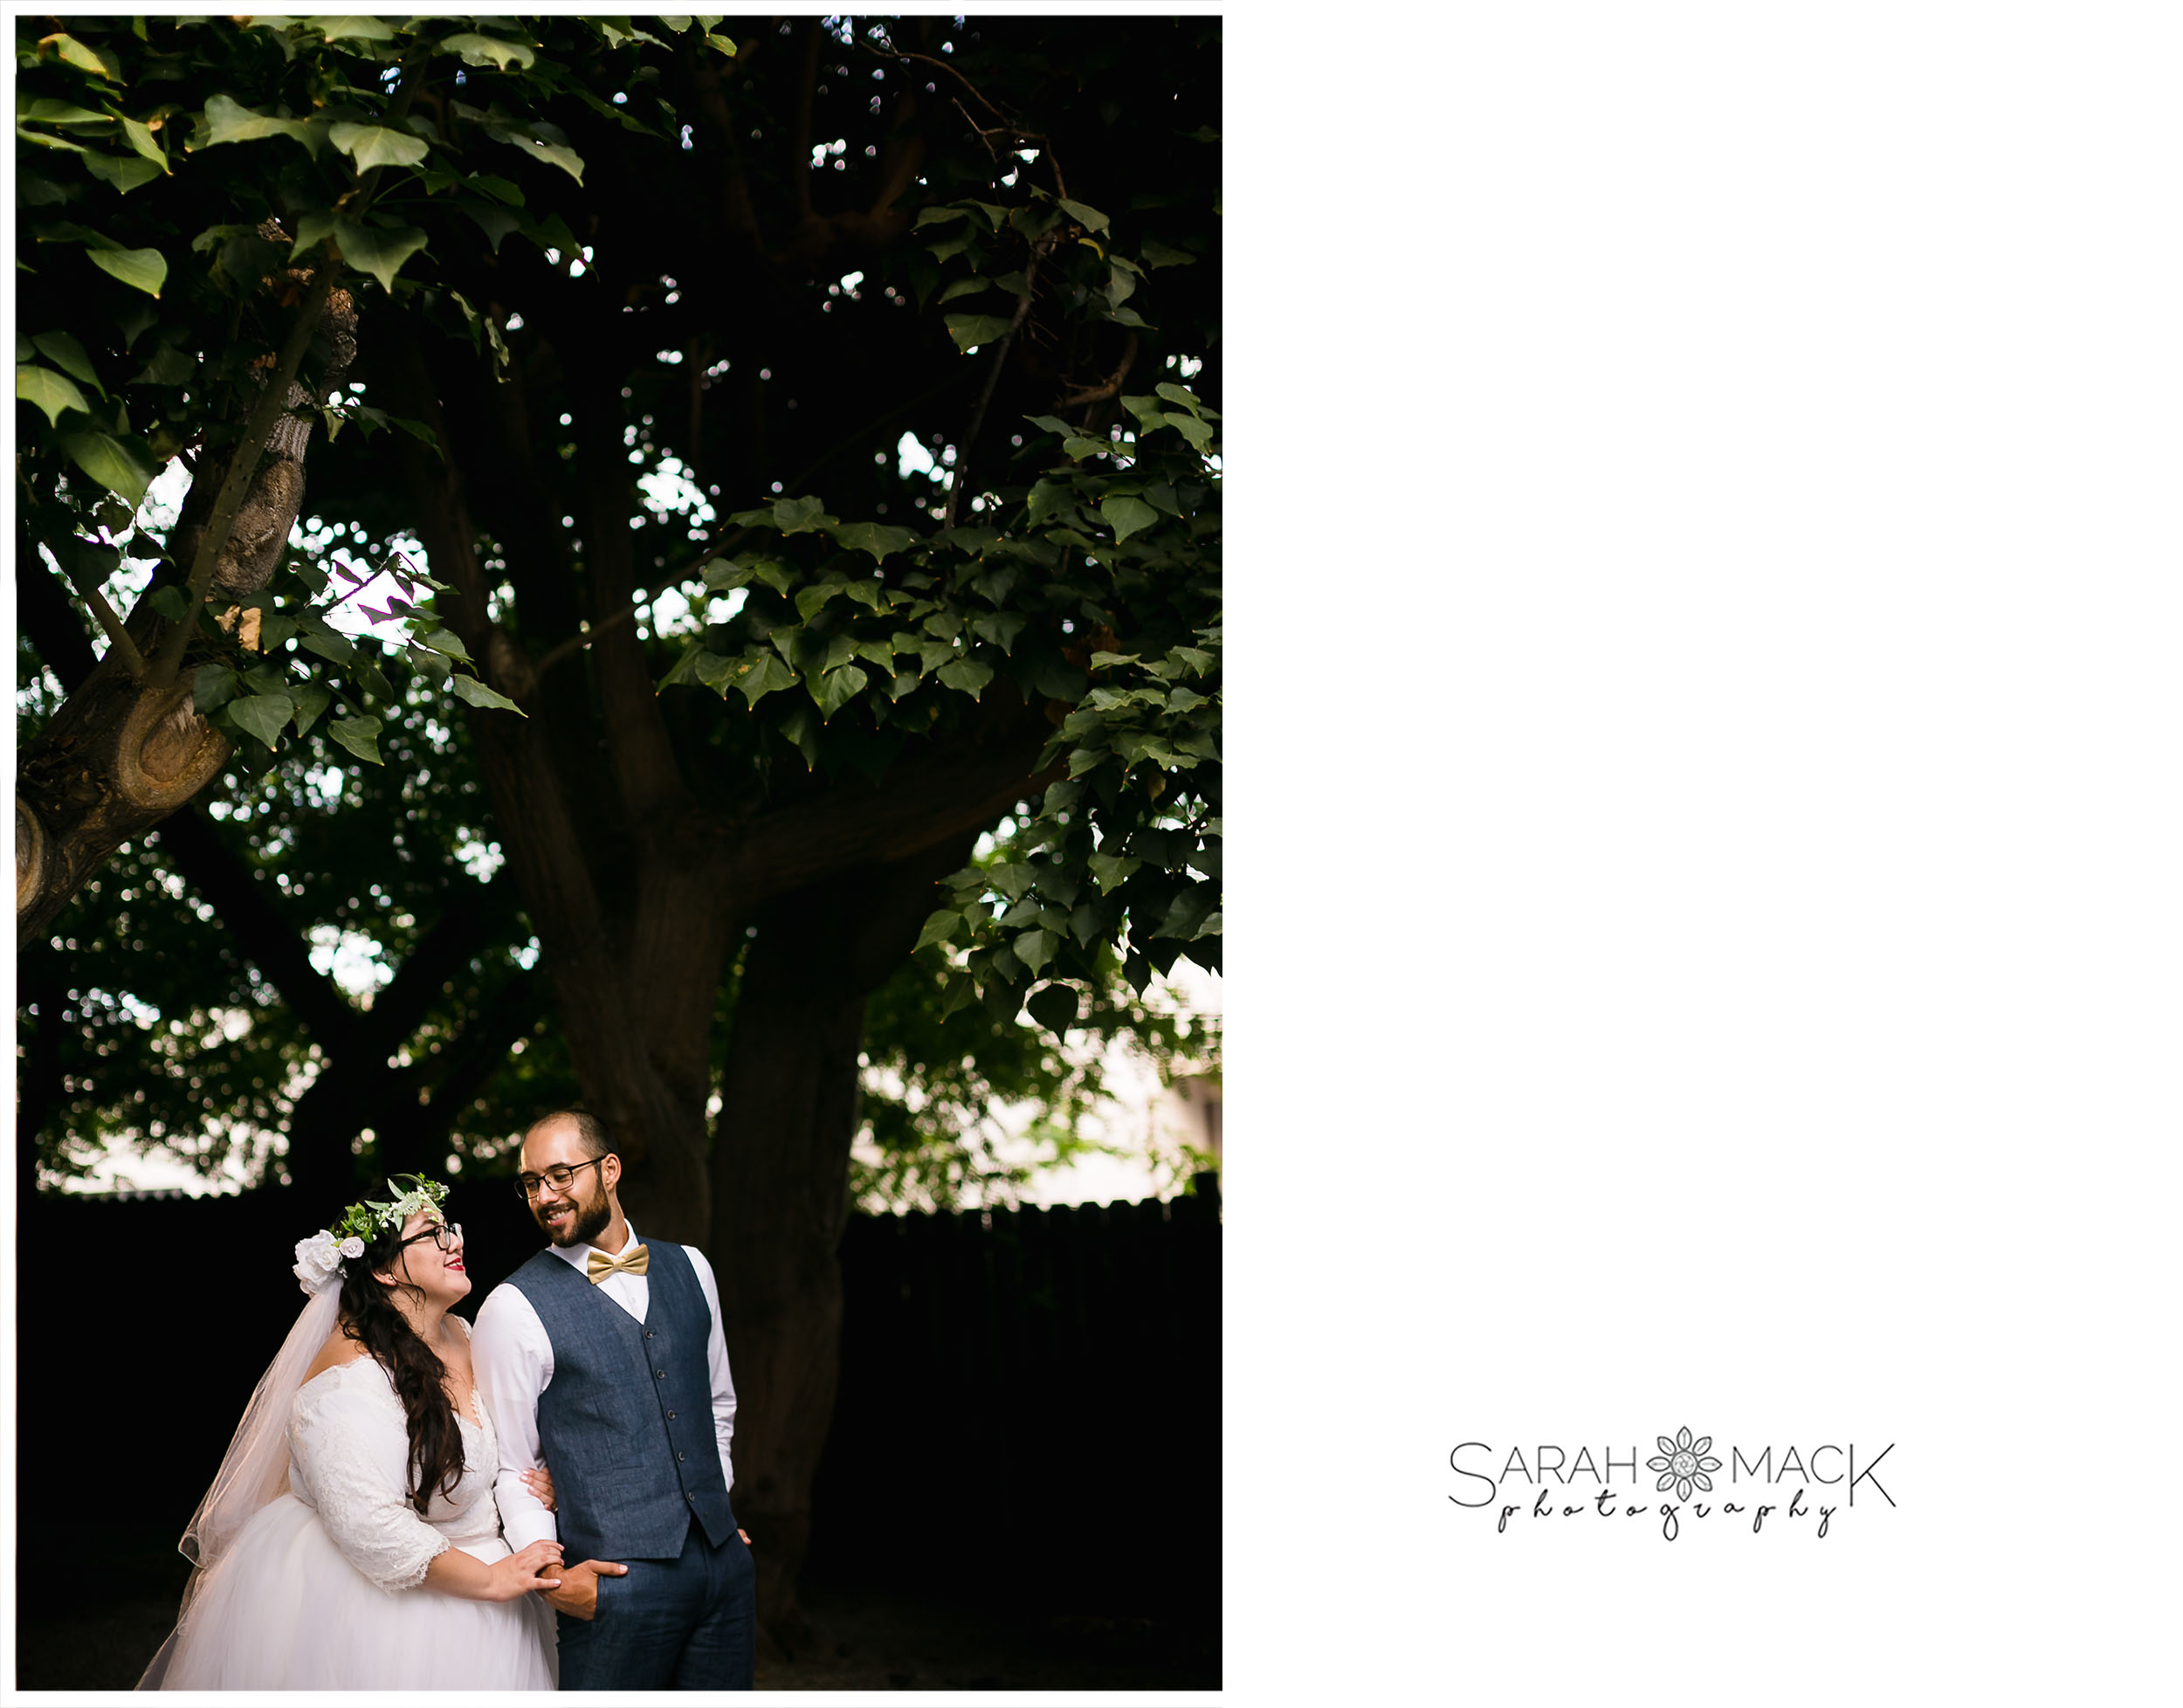 CK-Eureka-Building-Irvine-Wedding-37.jpg